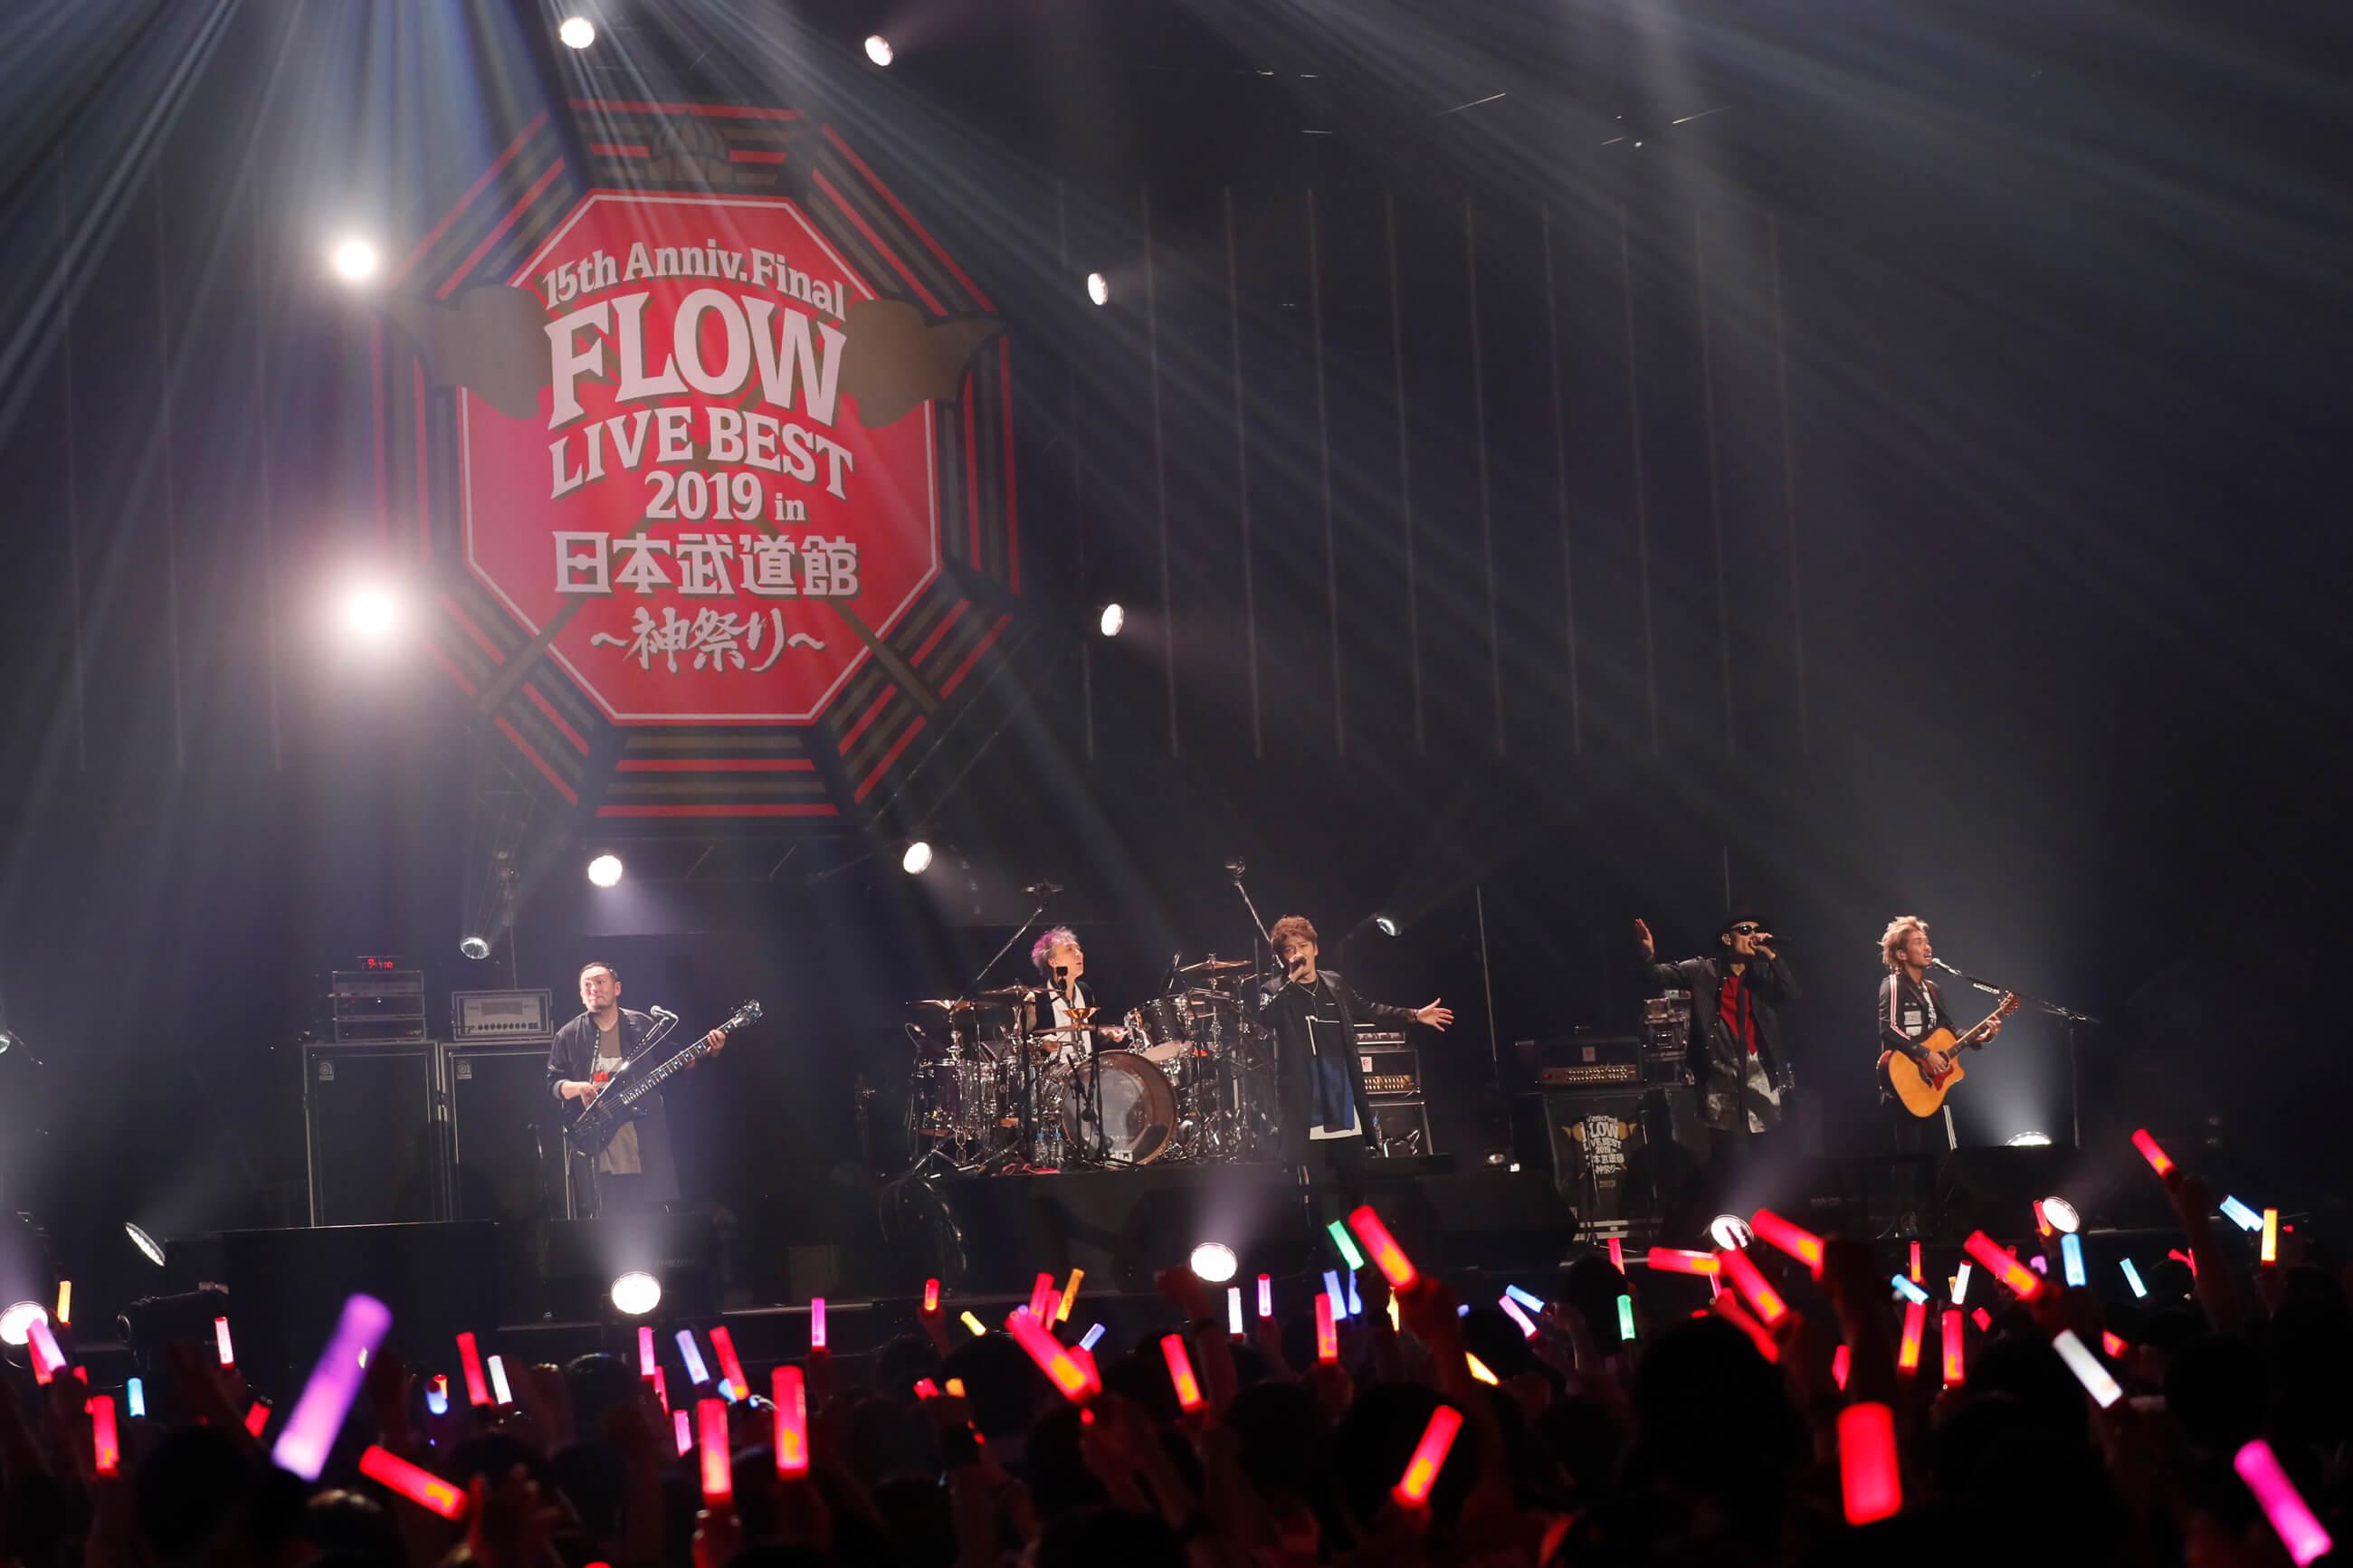 FLOW LIVE BEST 2019 in 日本武道館 ~神祭り~3